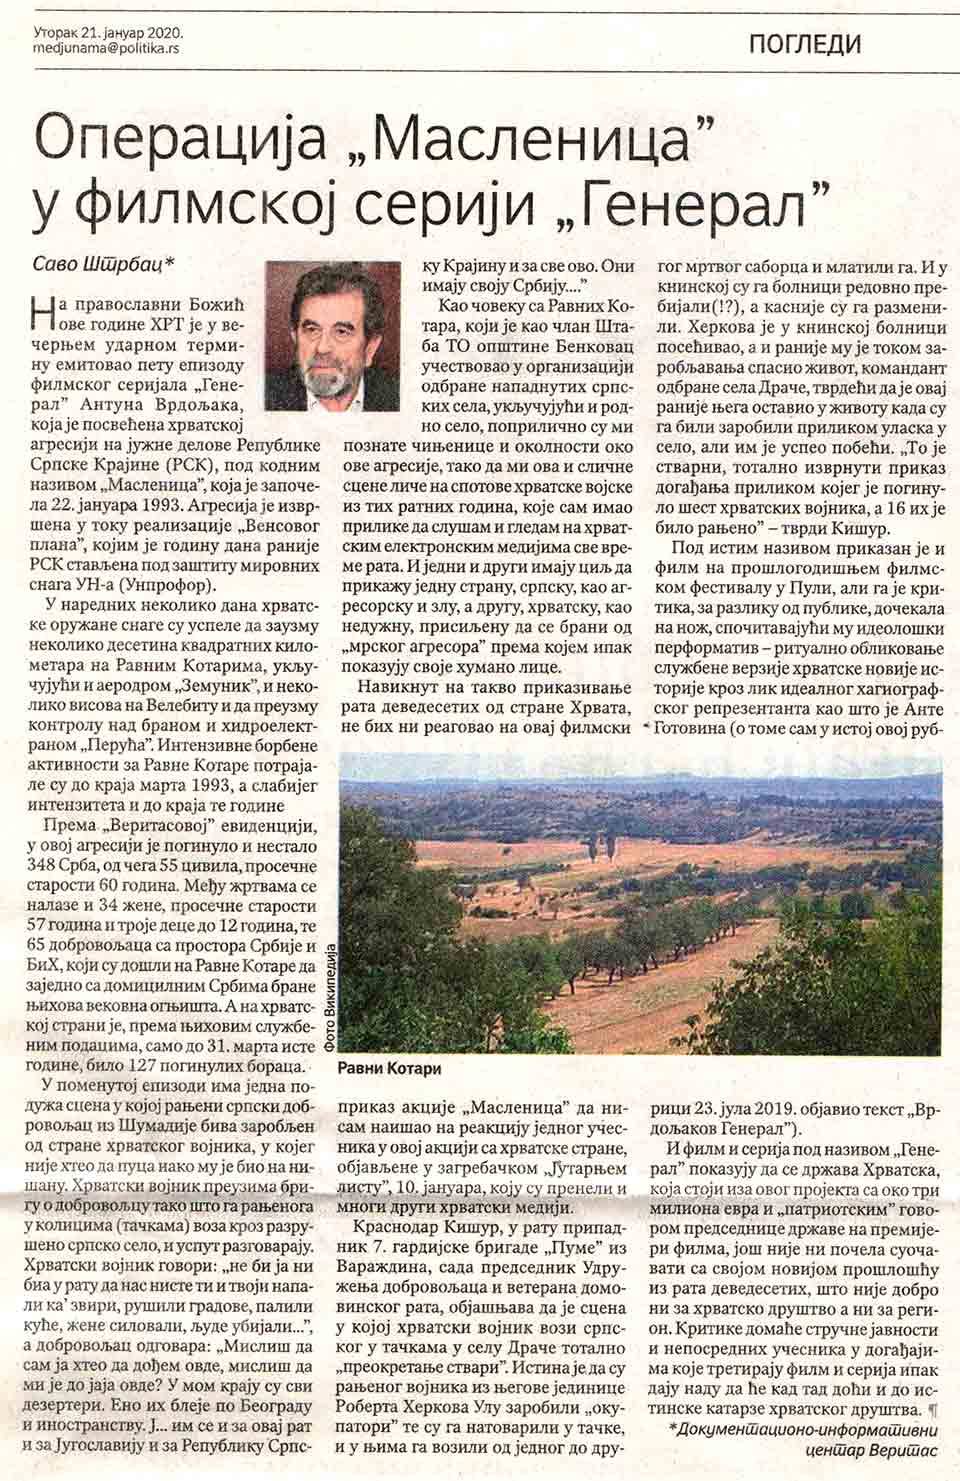 "Savo Štrbac: Operacija ""Maslenica"" u filmskoj seriji ""General"" Foto: Politika, scan"